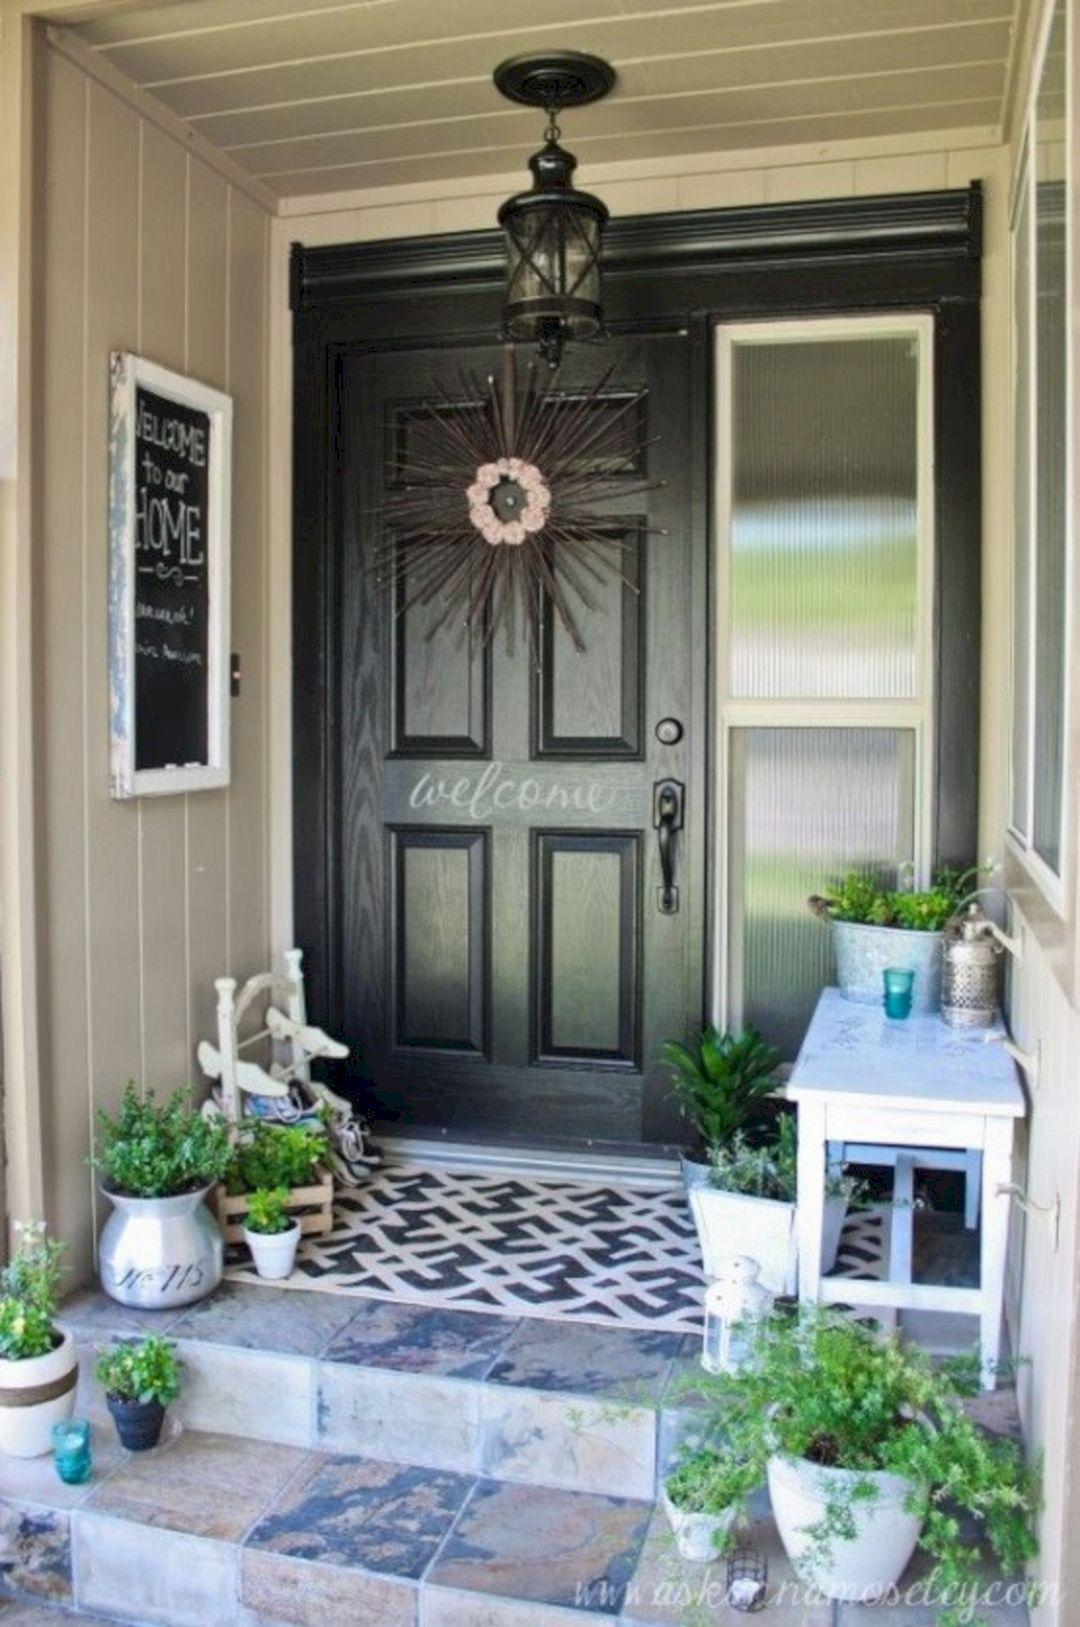 Wonderful 25 Tiny Front Porch Decorating Ideas On A Budget Freshouz Com Front Porch Decorating Front Porch Makeover Front Porch Design